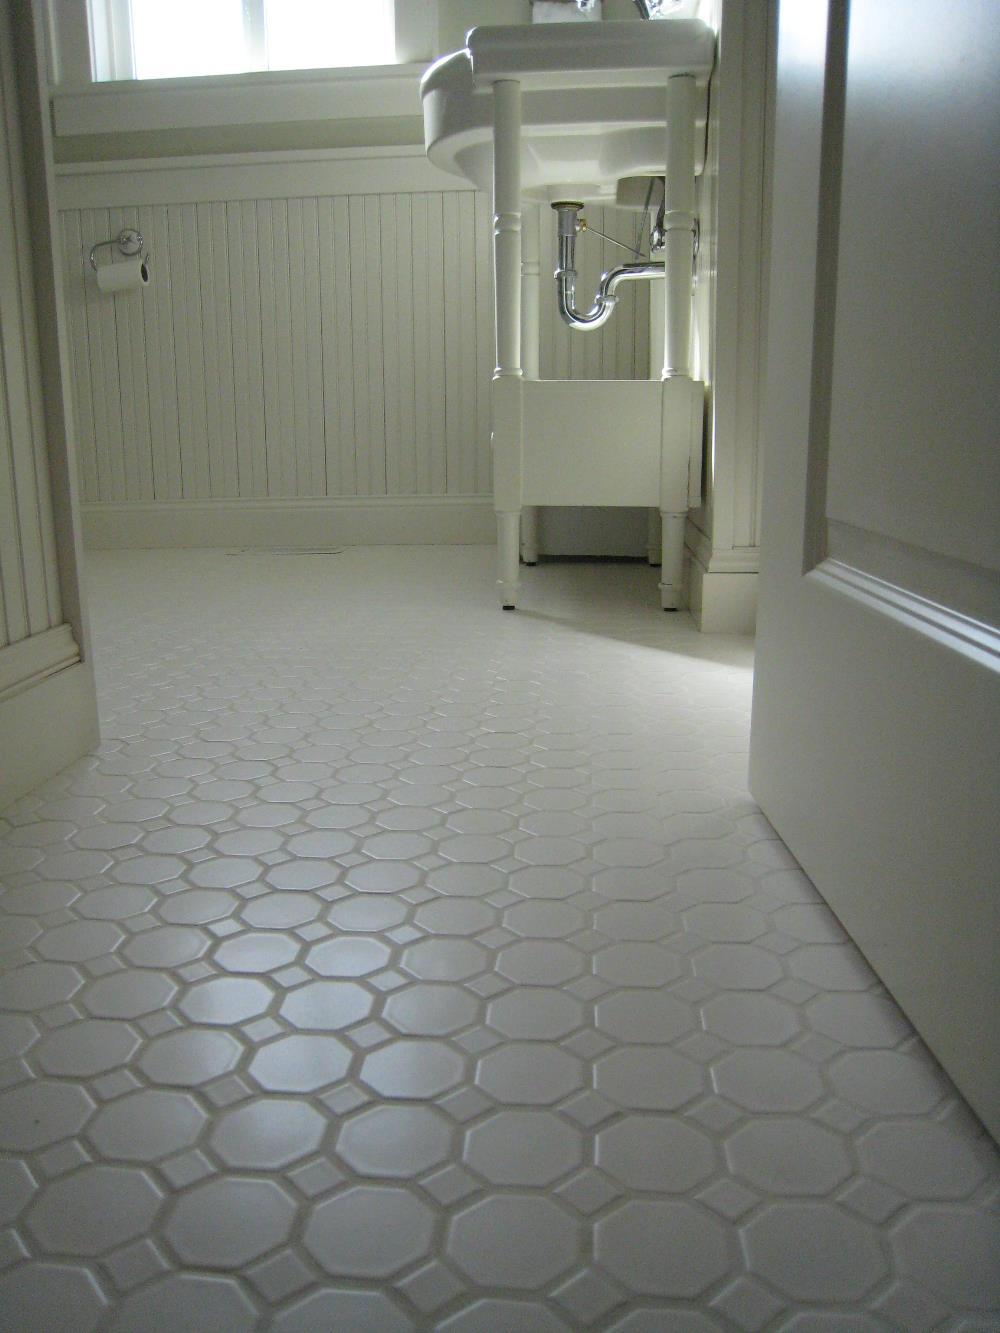 Vintage Bathroom Wall Decor Ideas